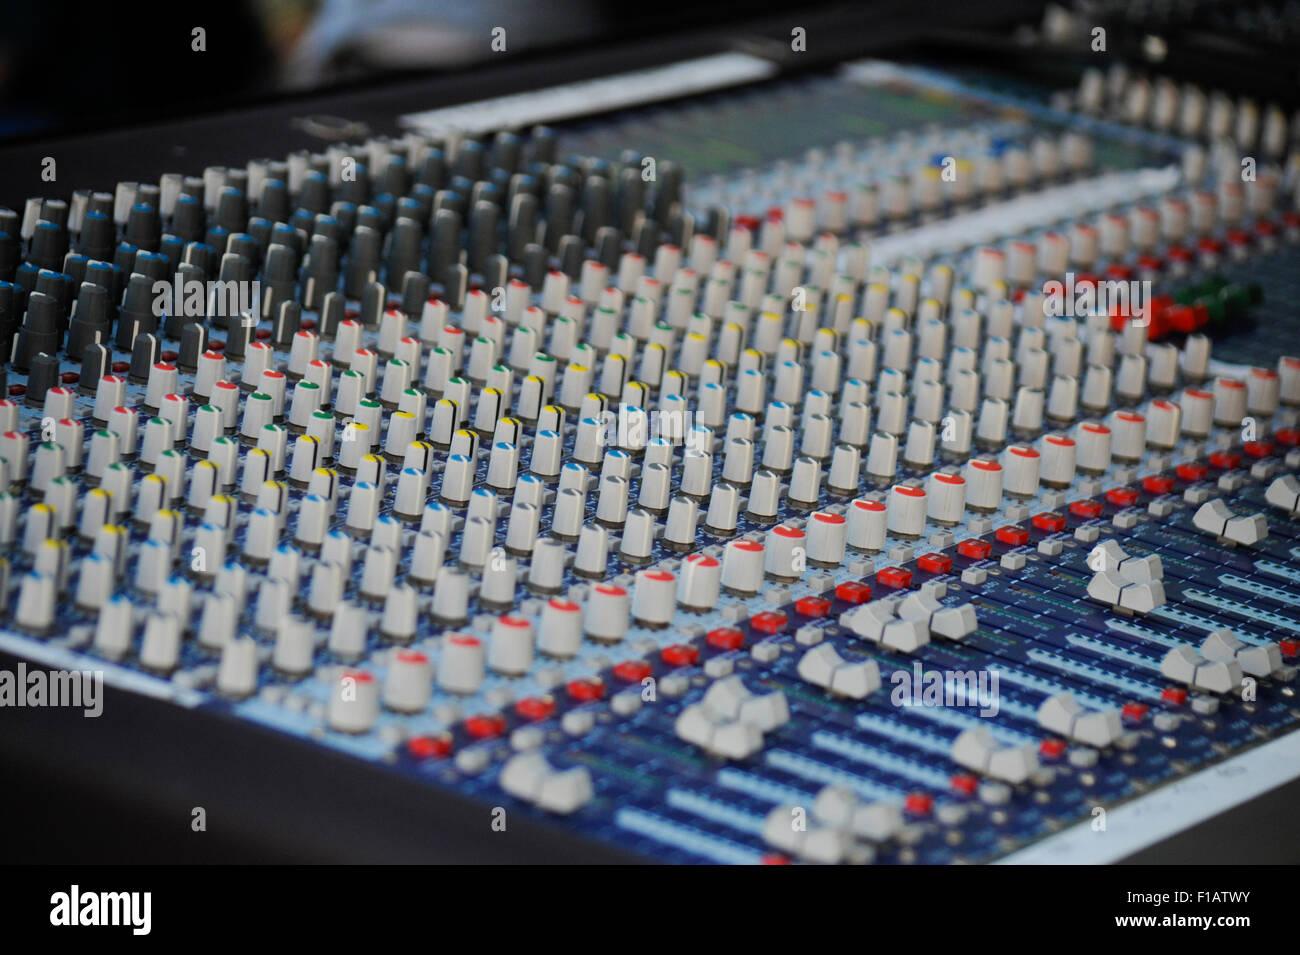 Sound Board Soundboard Control Stock Photos & Sound Board